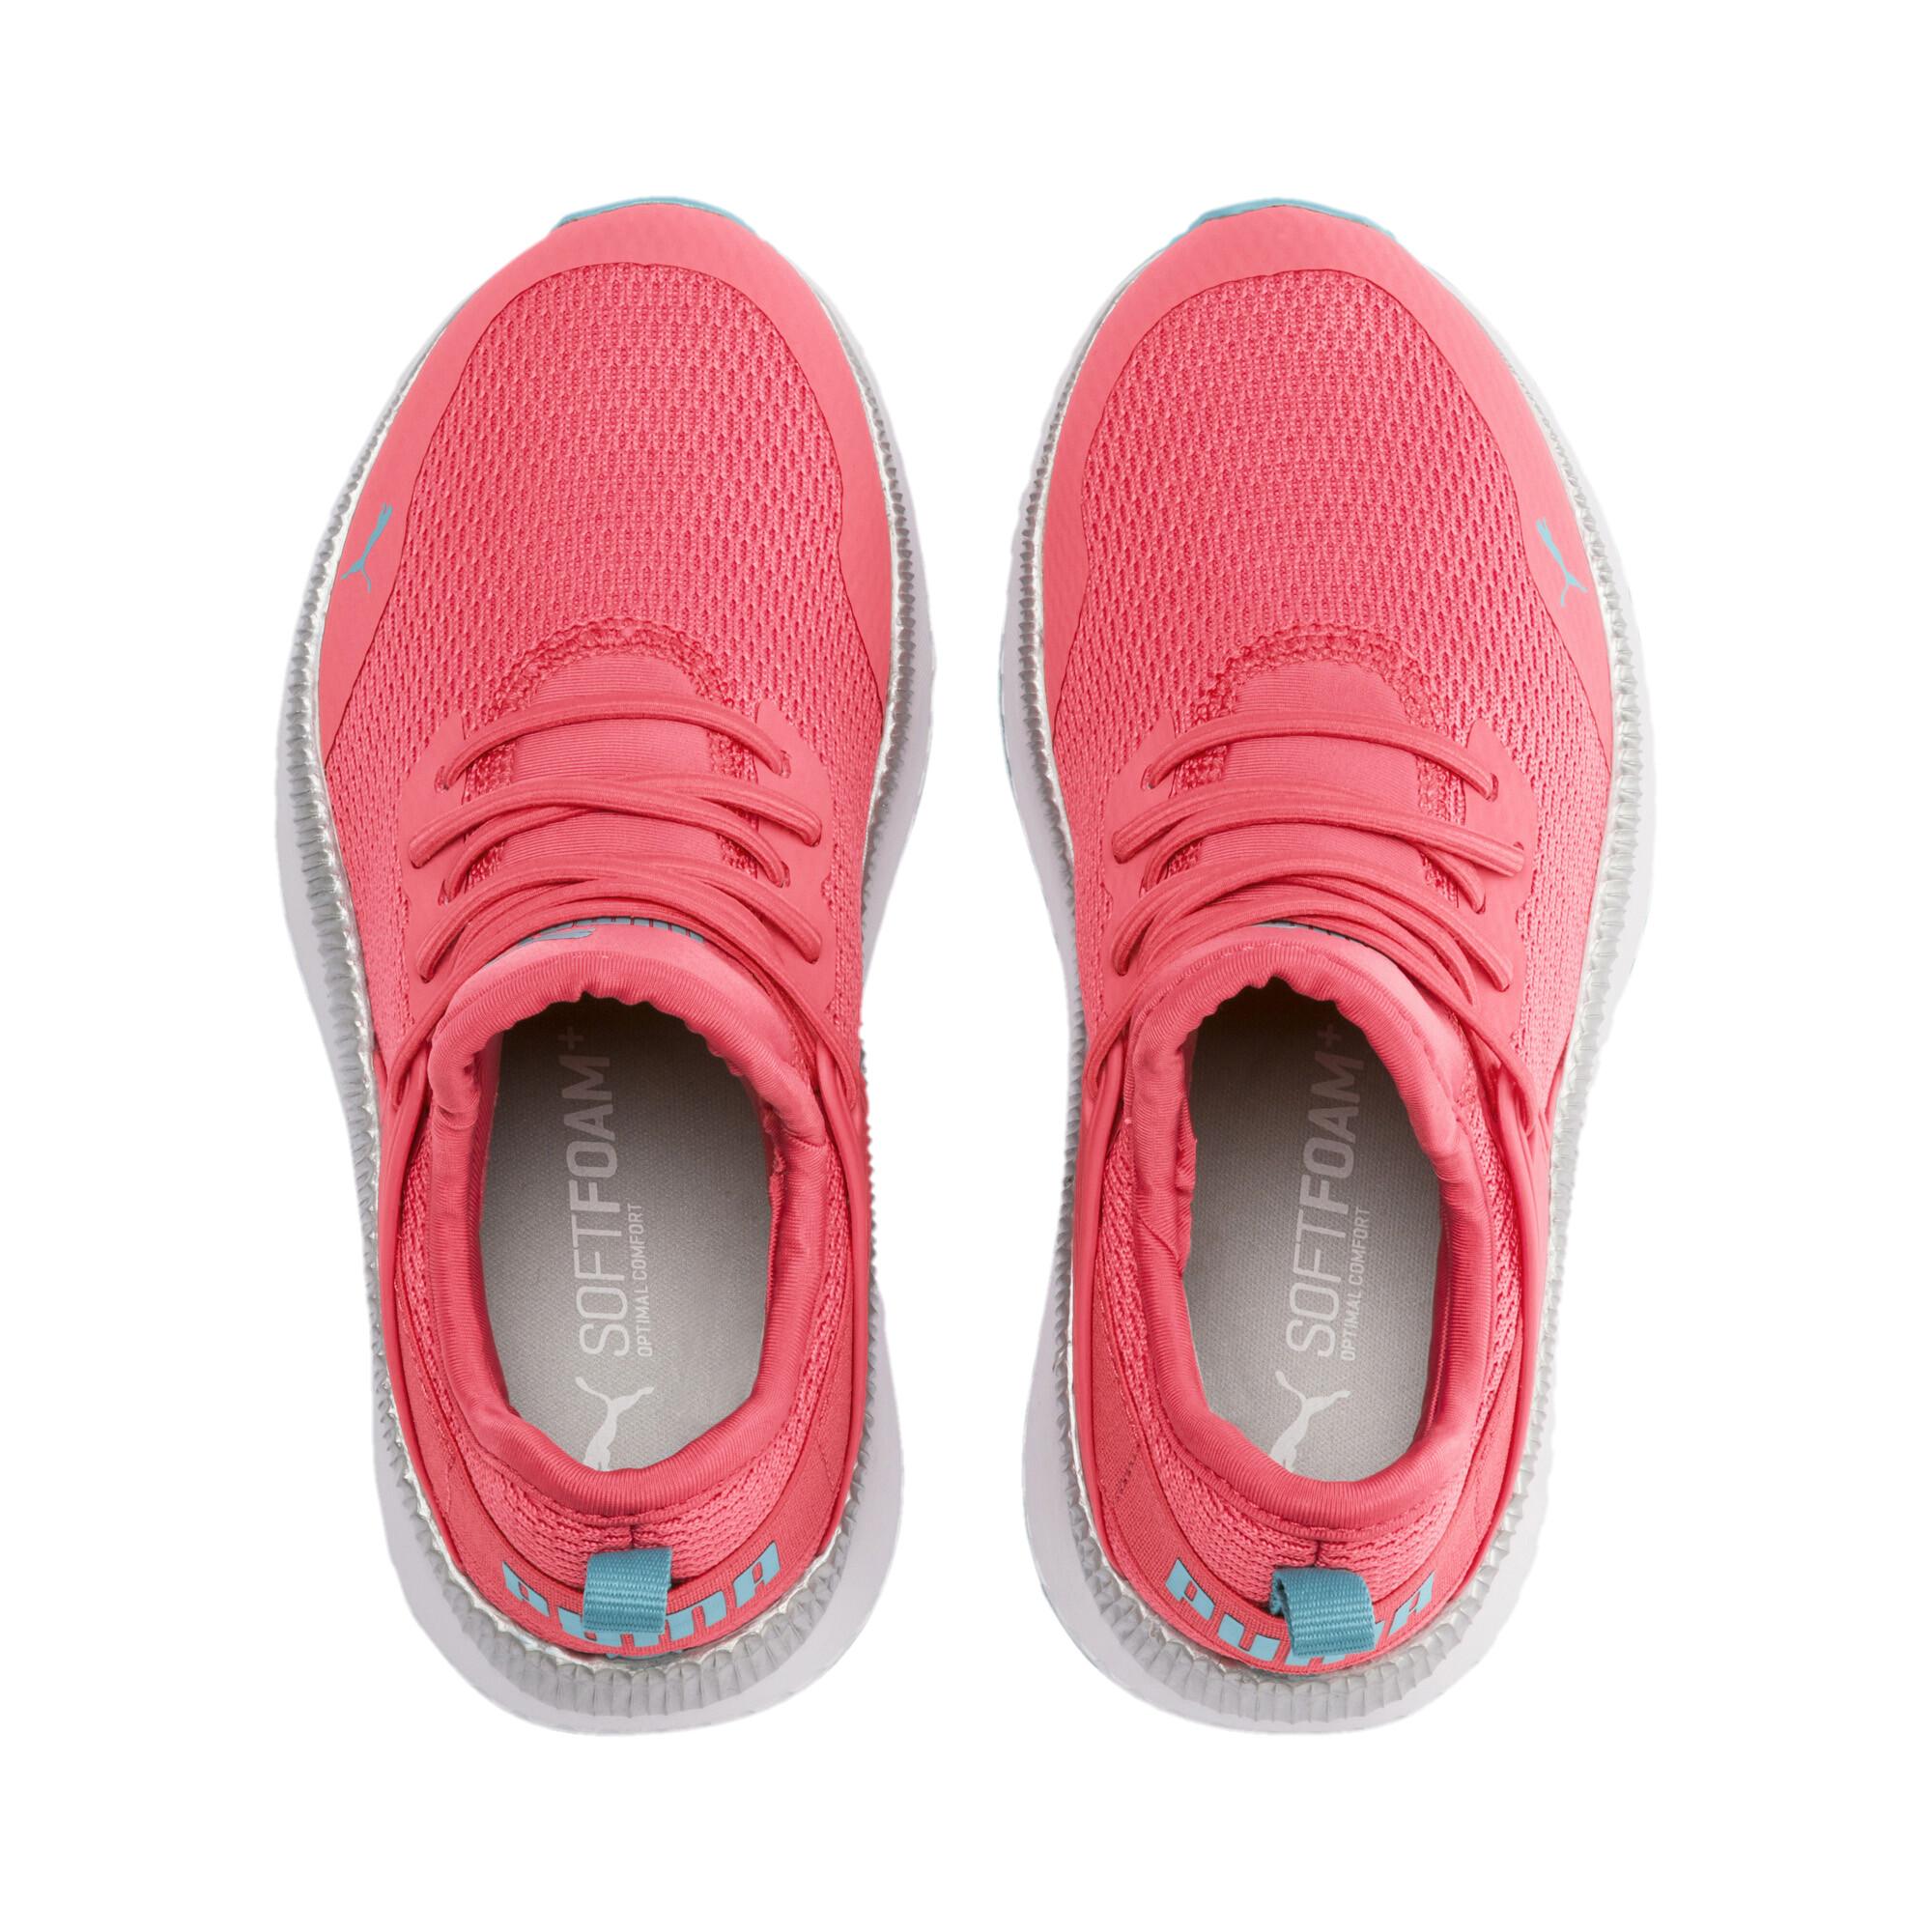 PUMA-Pacer-Next-Cage-Metallic-Little-Kids-039-Shoes-Girls-Shoe-Kids thumbnail 13